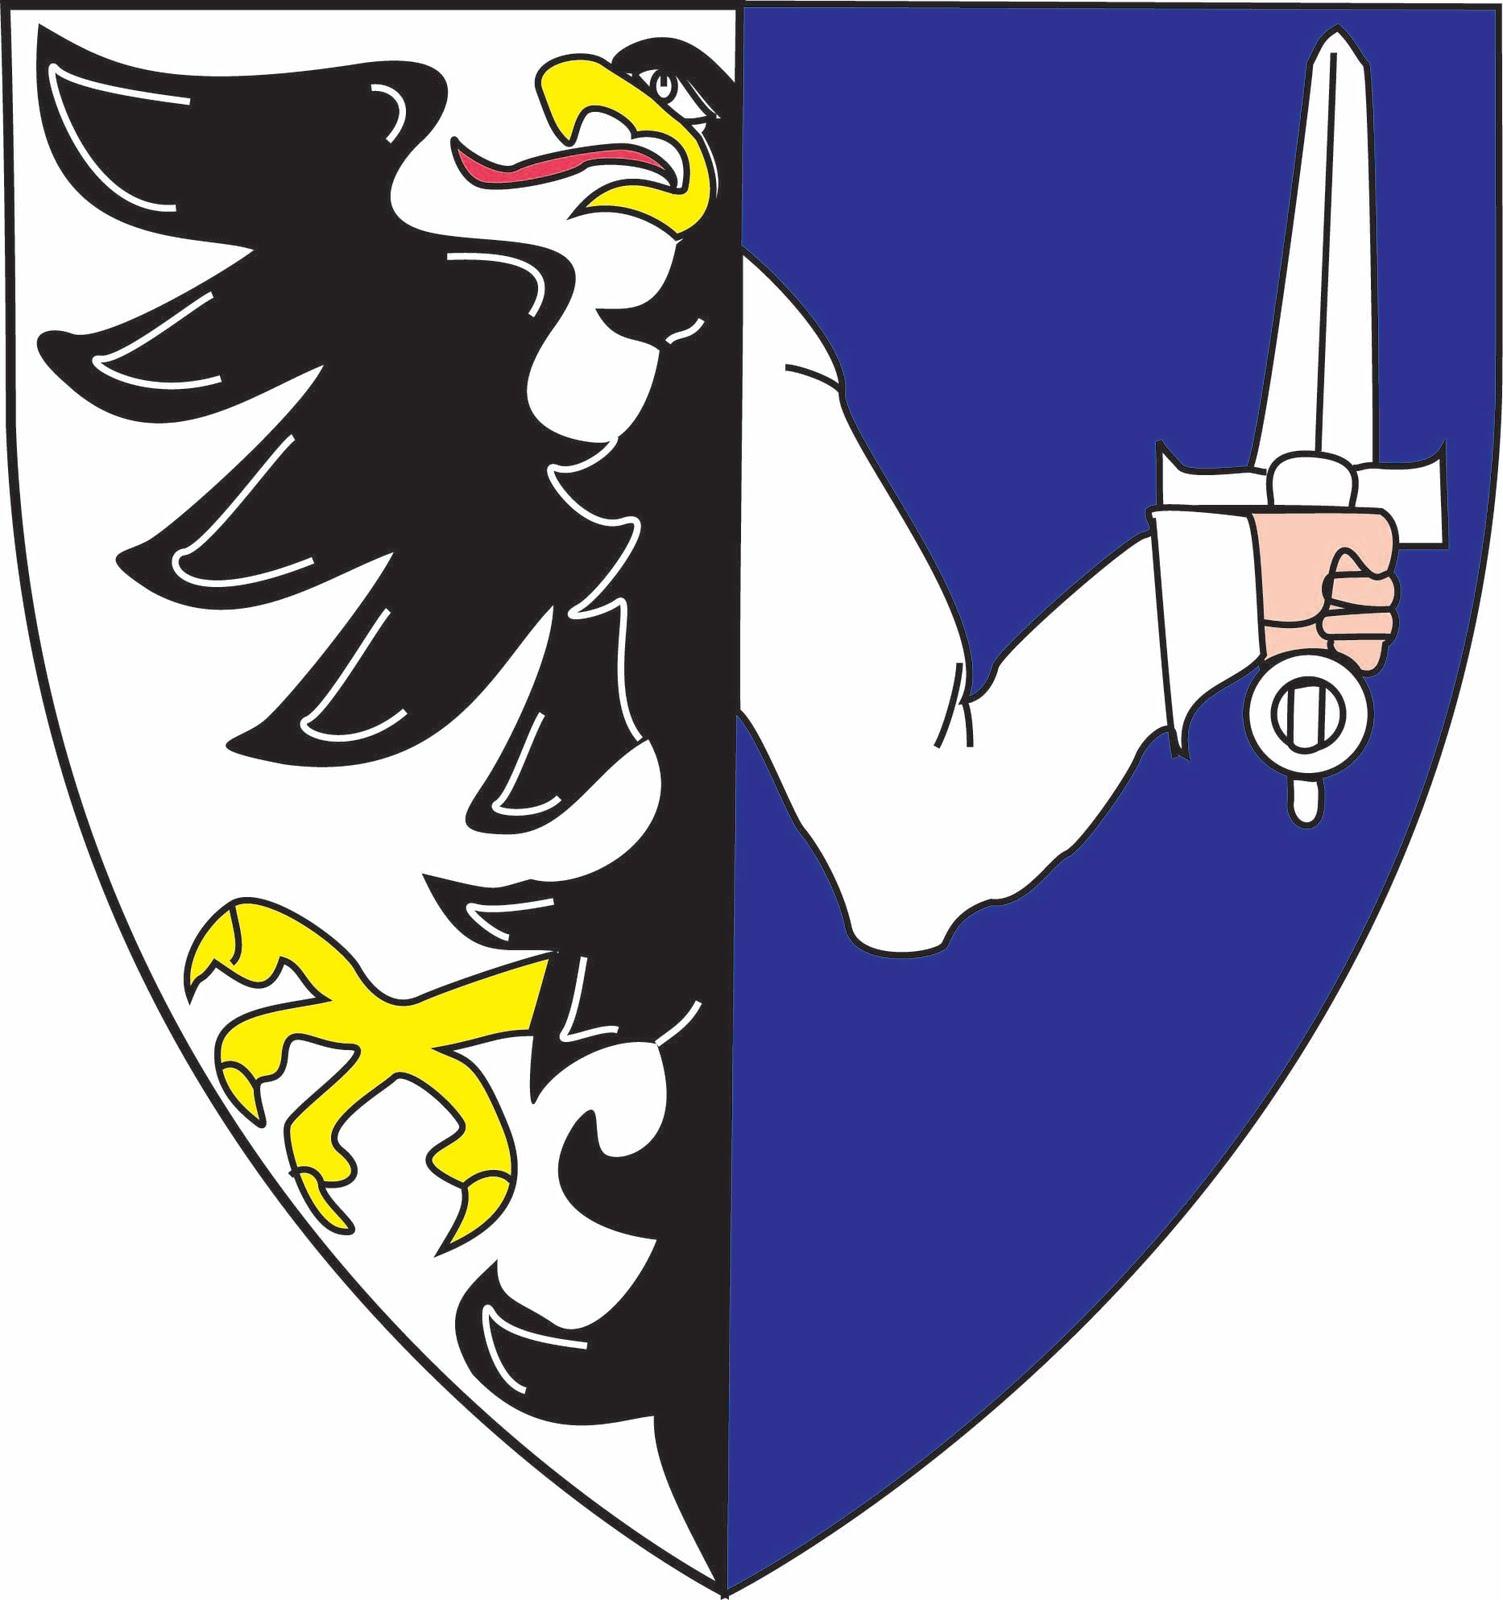 Graft-De Rijp Graft, Netherlands Enkhuizen West-Graftdijk, shield, shield,  fictional Character, heraldry png   PNGWing